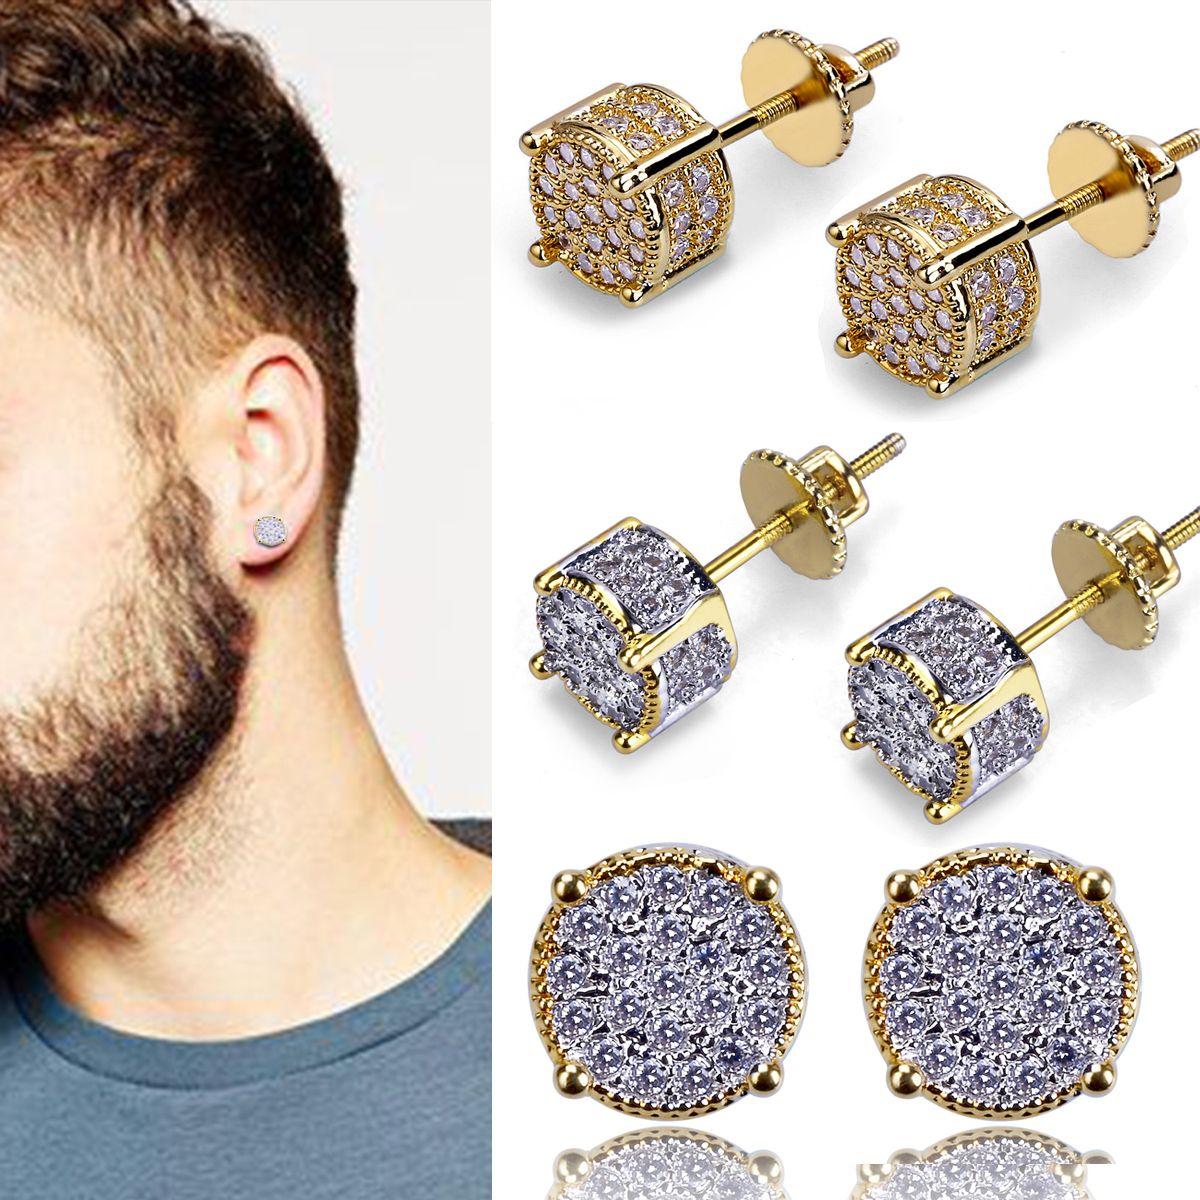 New 18K Gold Hiphop CZ Zircon Round Stud Earrings 0.7cm for Men Women and Girls Gifts Diamond Earrings Studs Rock Rapper Jewelry Wholesale